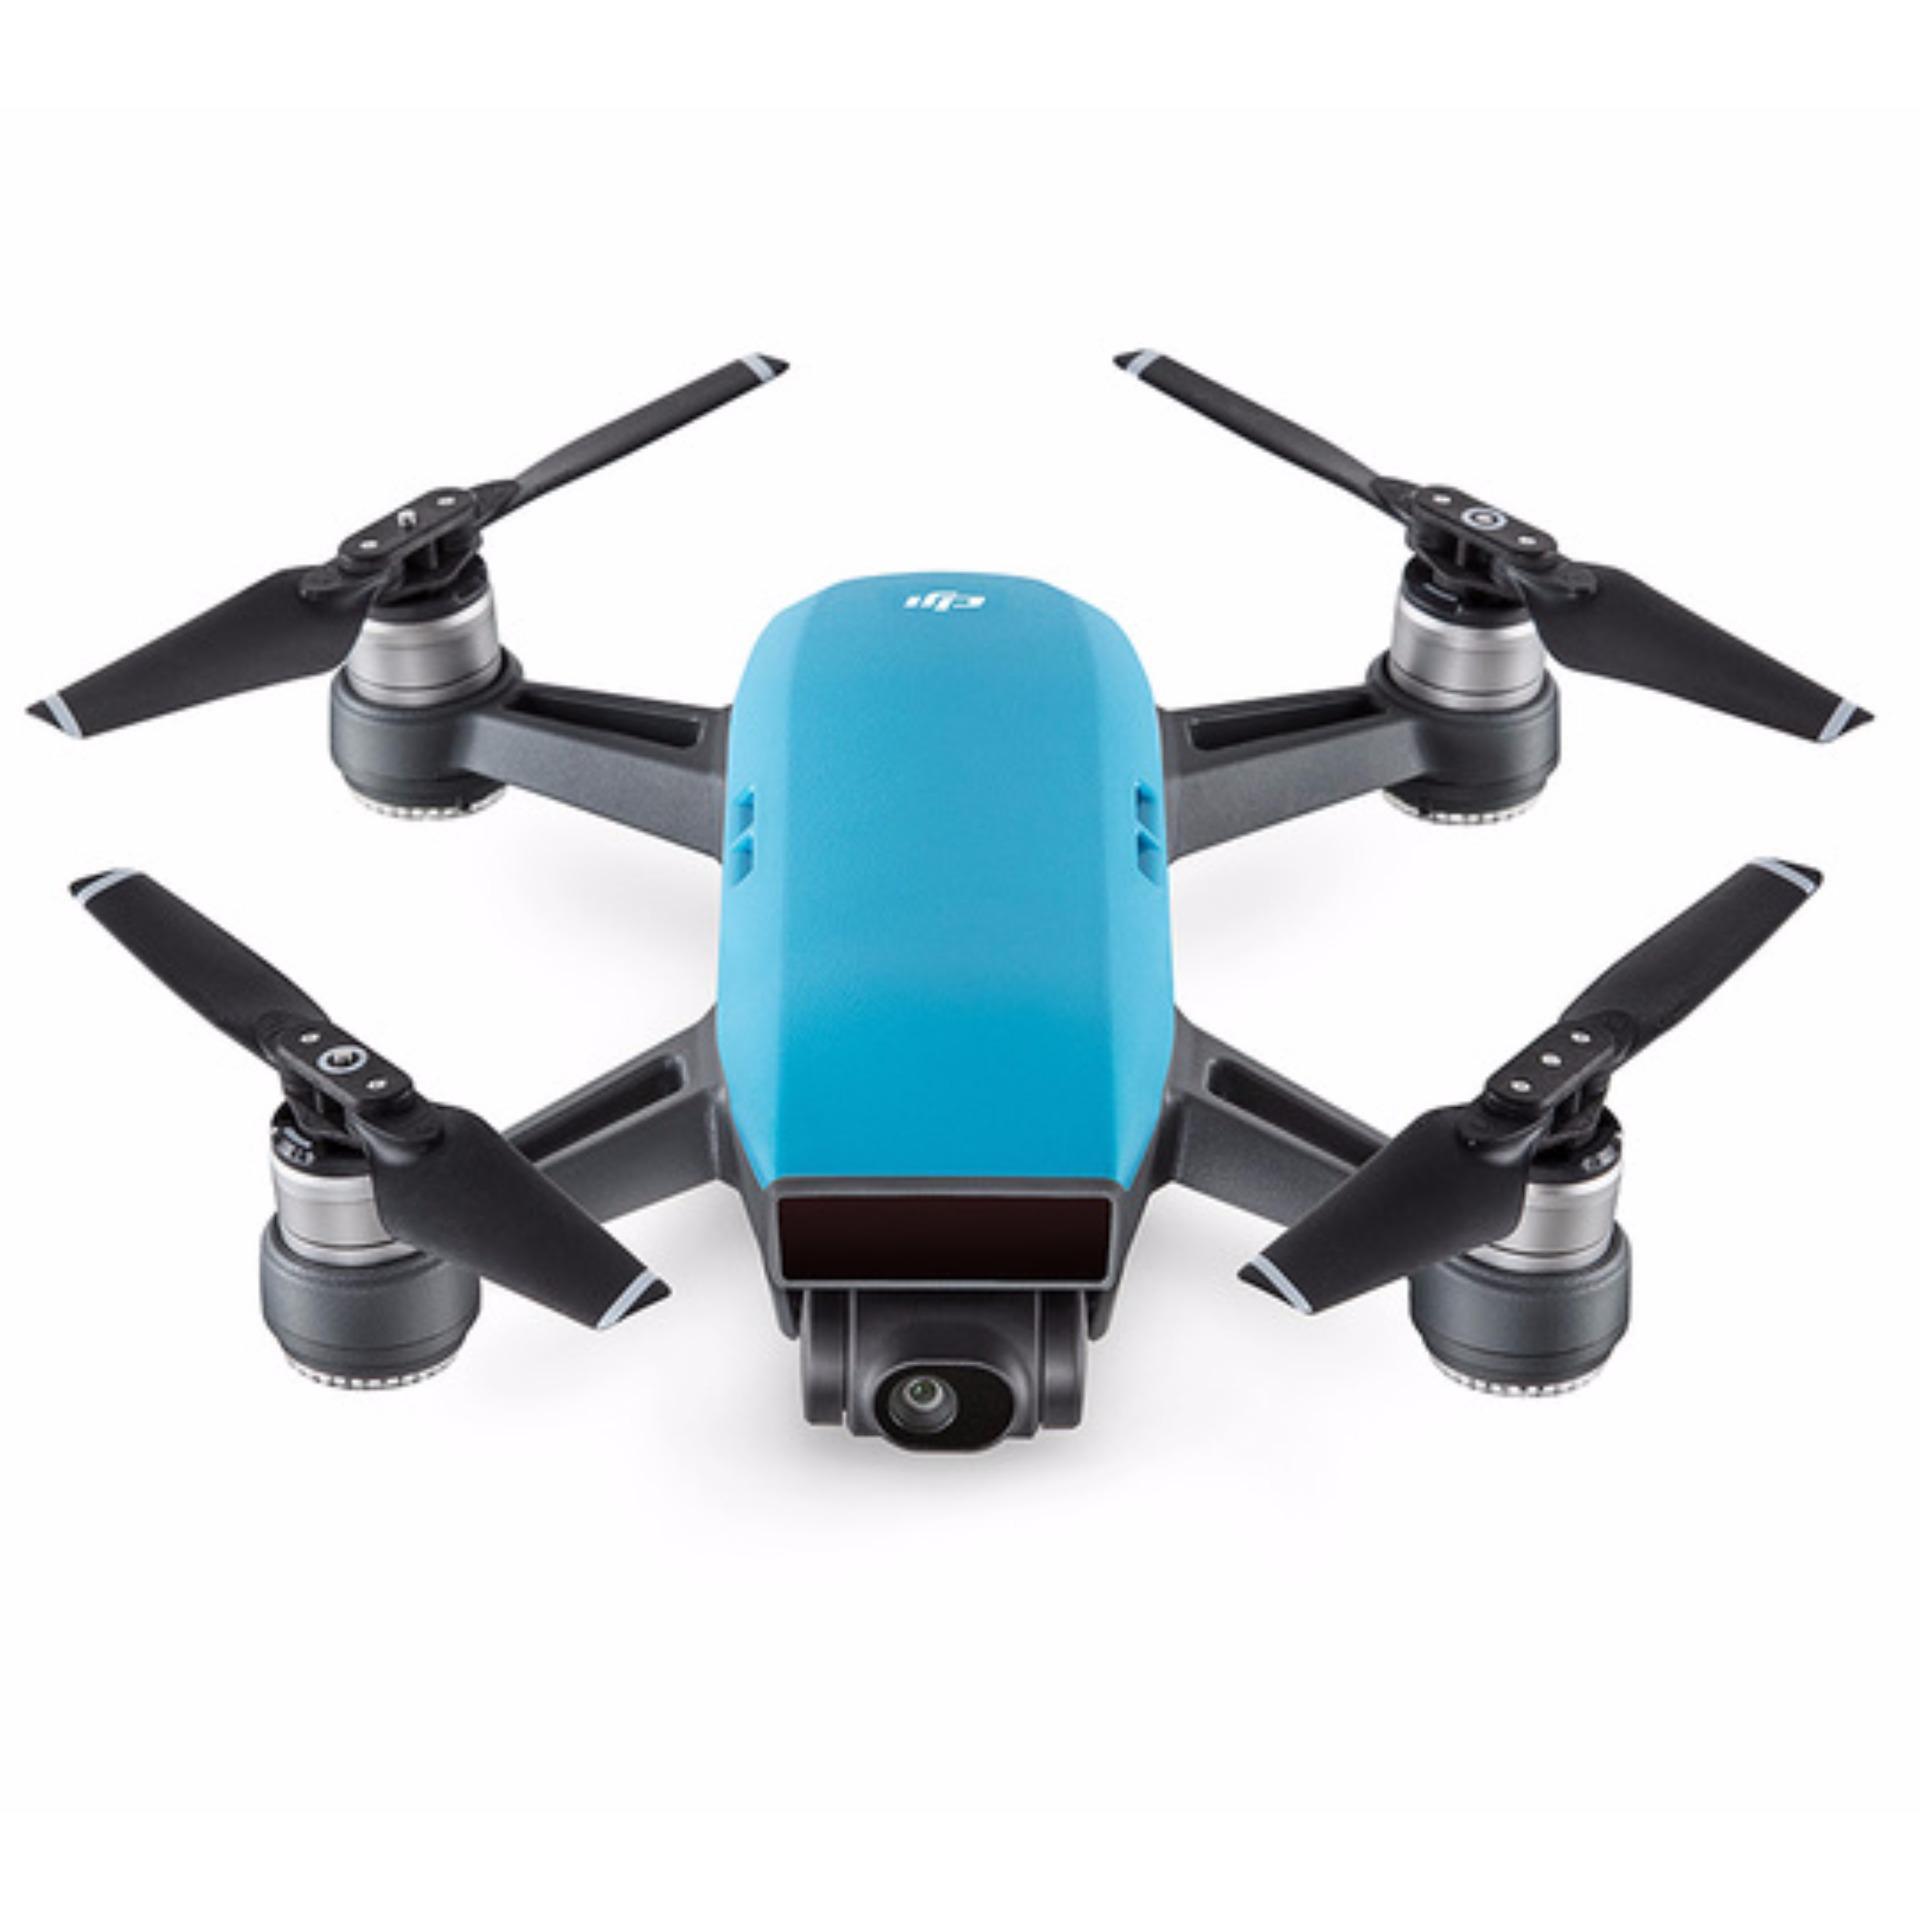 DJI Spark Fly More Combo (Sky Blue)